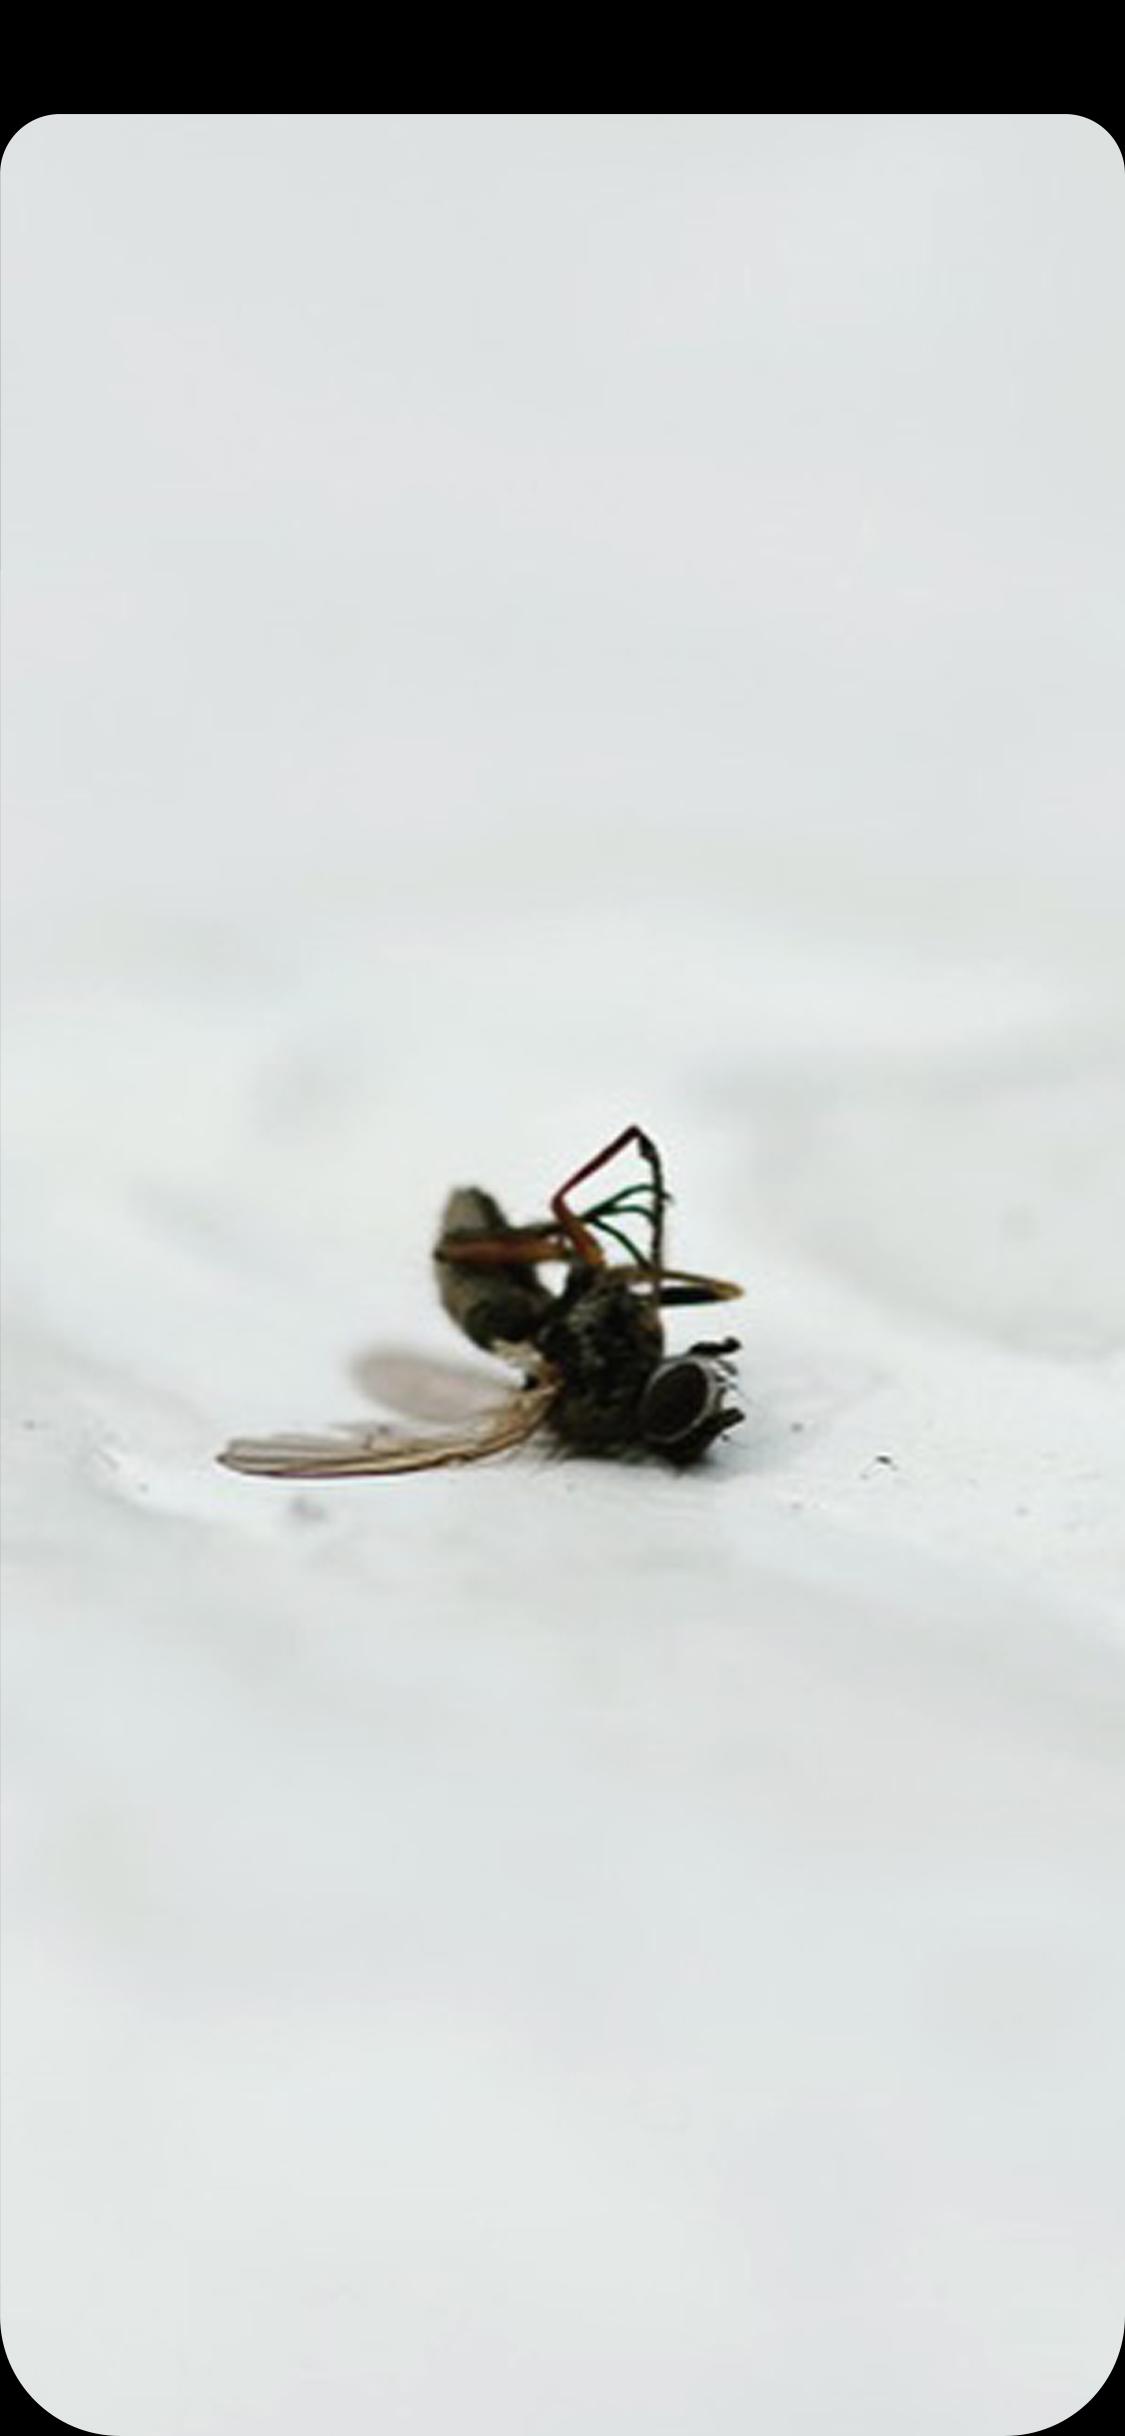 geirwerner-Deadfly.jpg